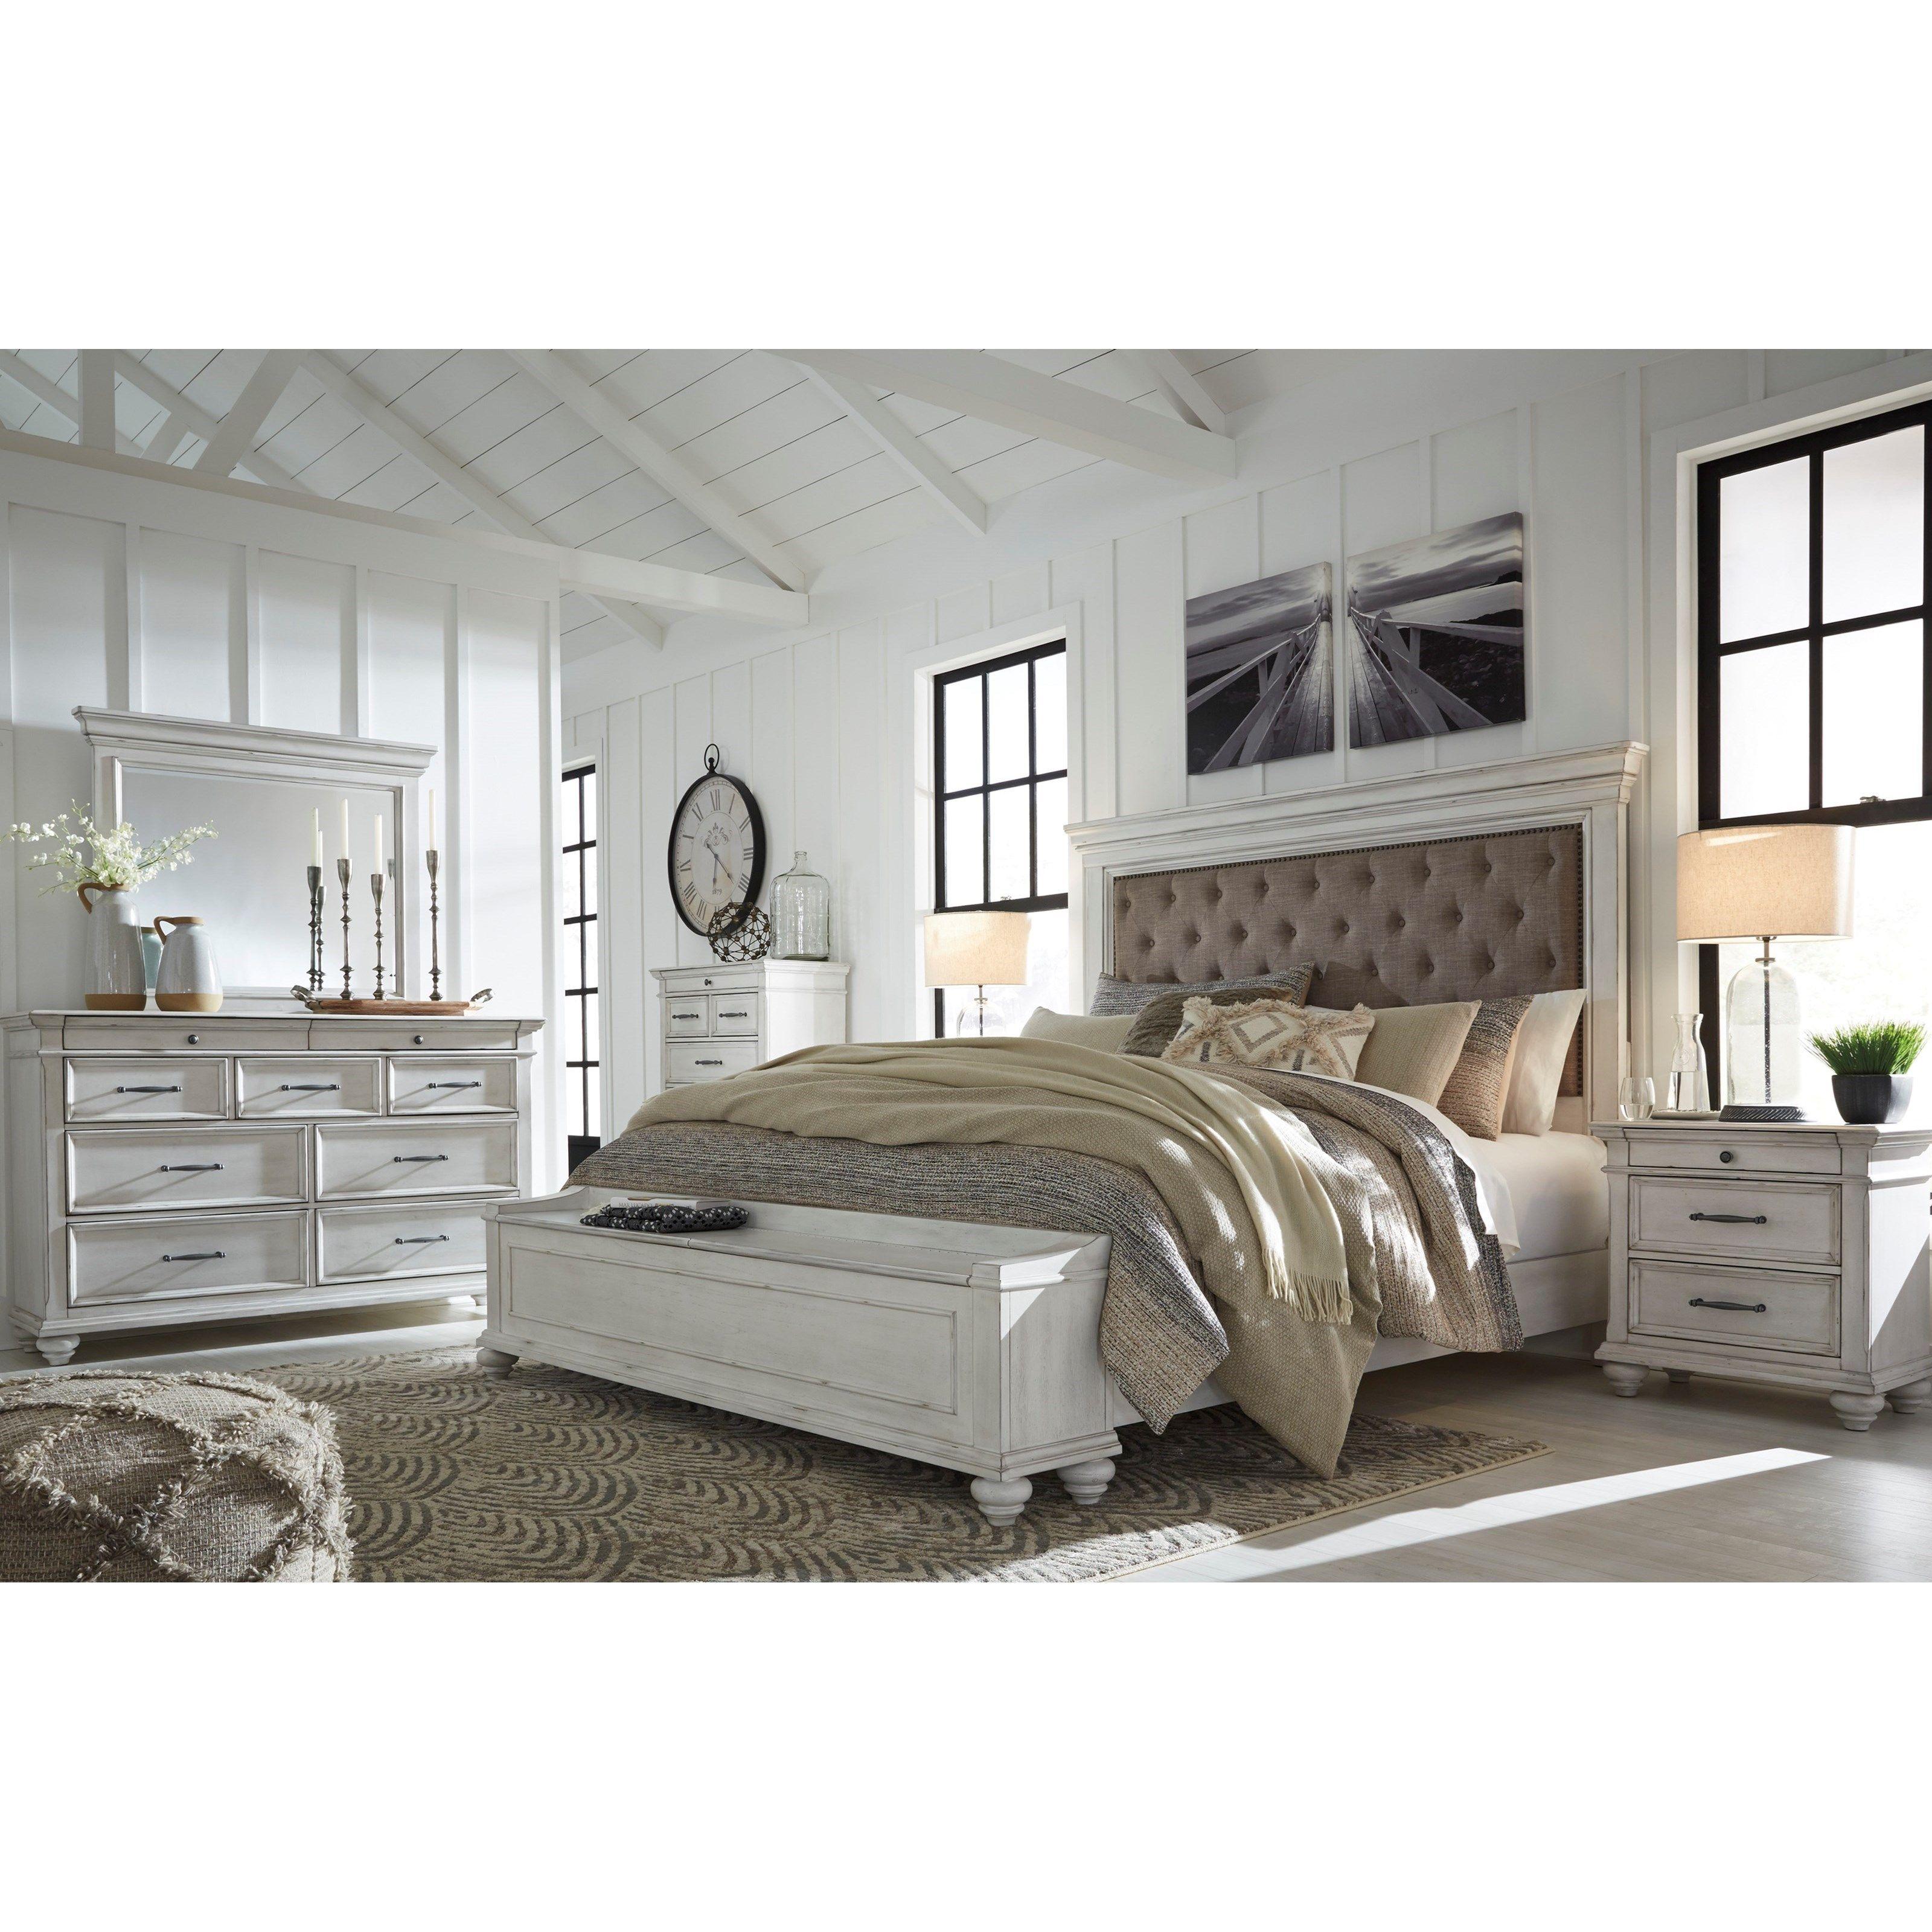 Kanwyn Queen Bedroom Group By Benchcraft At Miskelly Furniture King Bedroom Sets Bedroom Set Bedroom Sets Queen